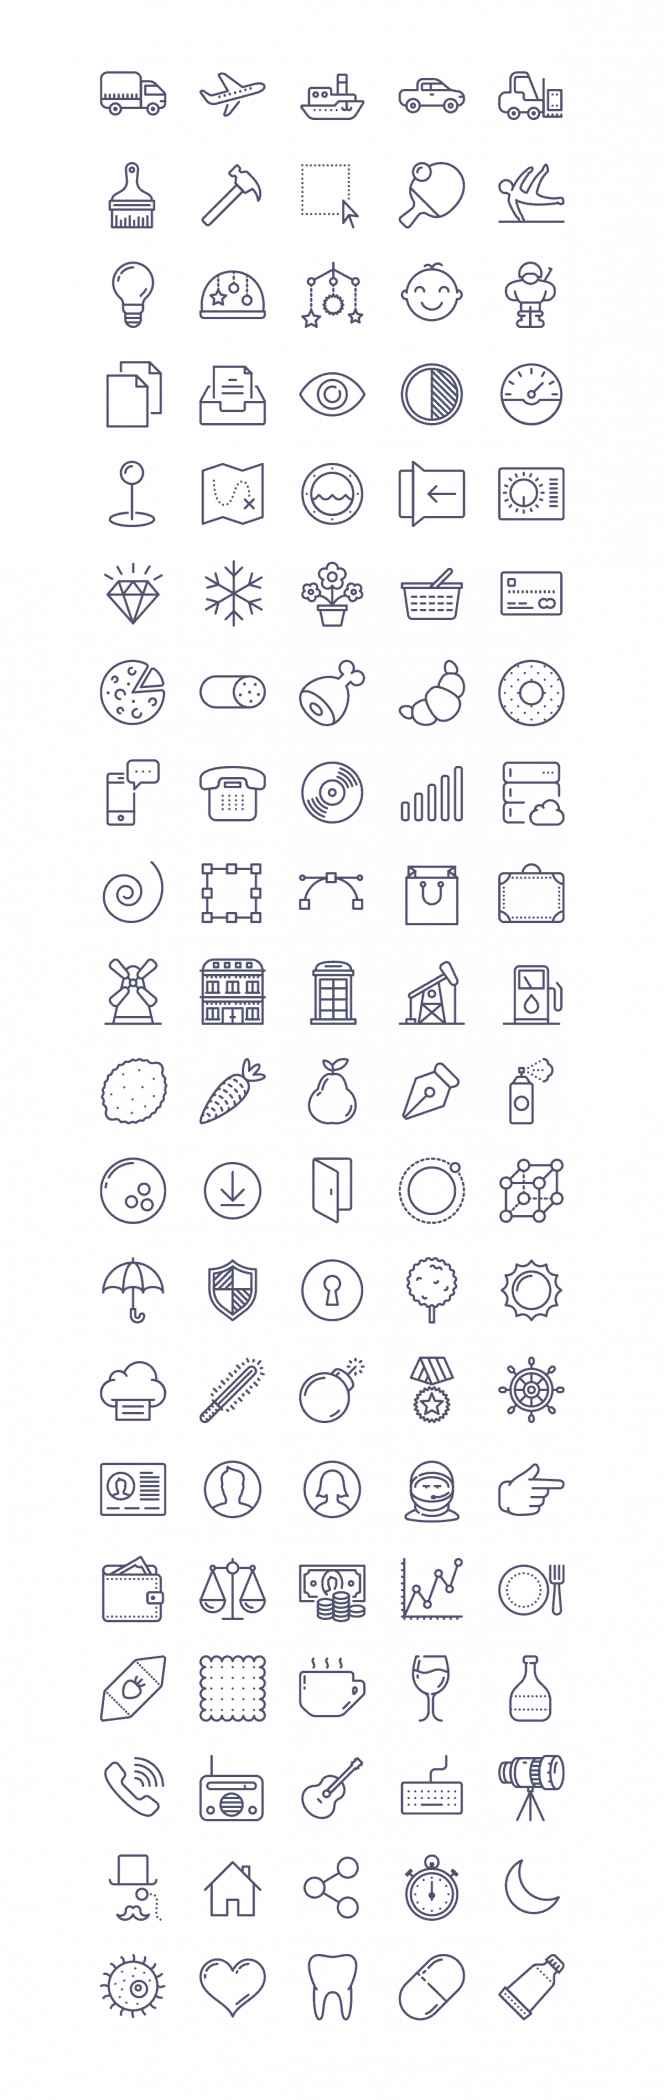 100 free Unigrid vector icons | IconStore